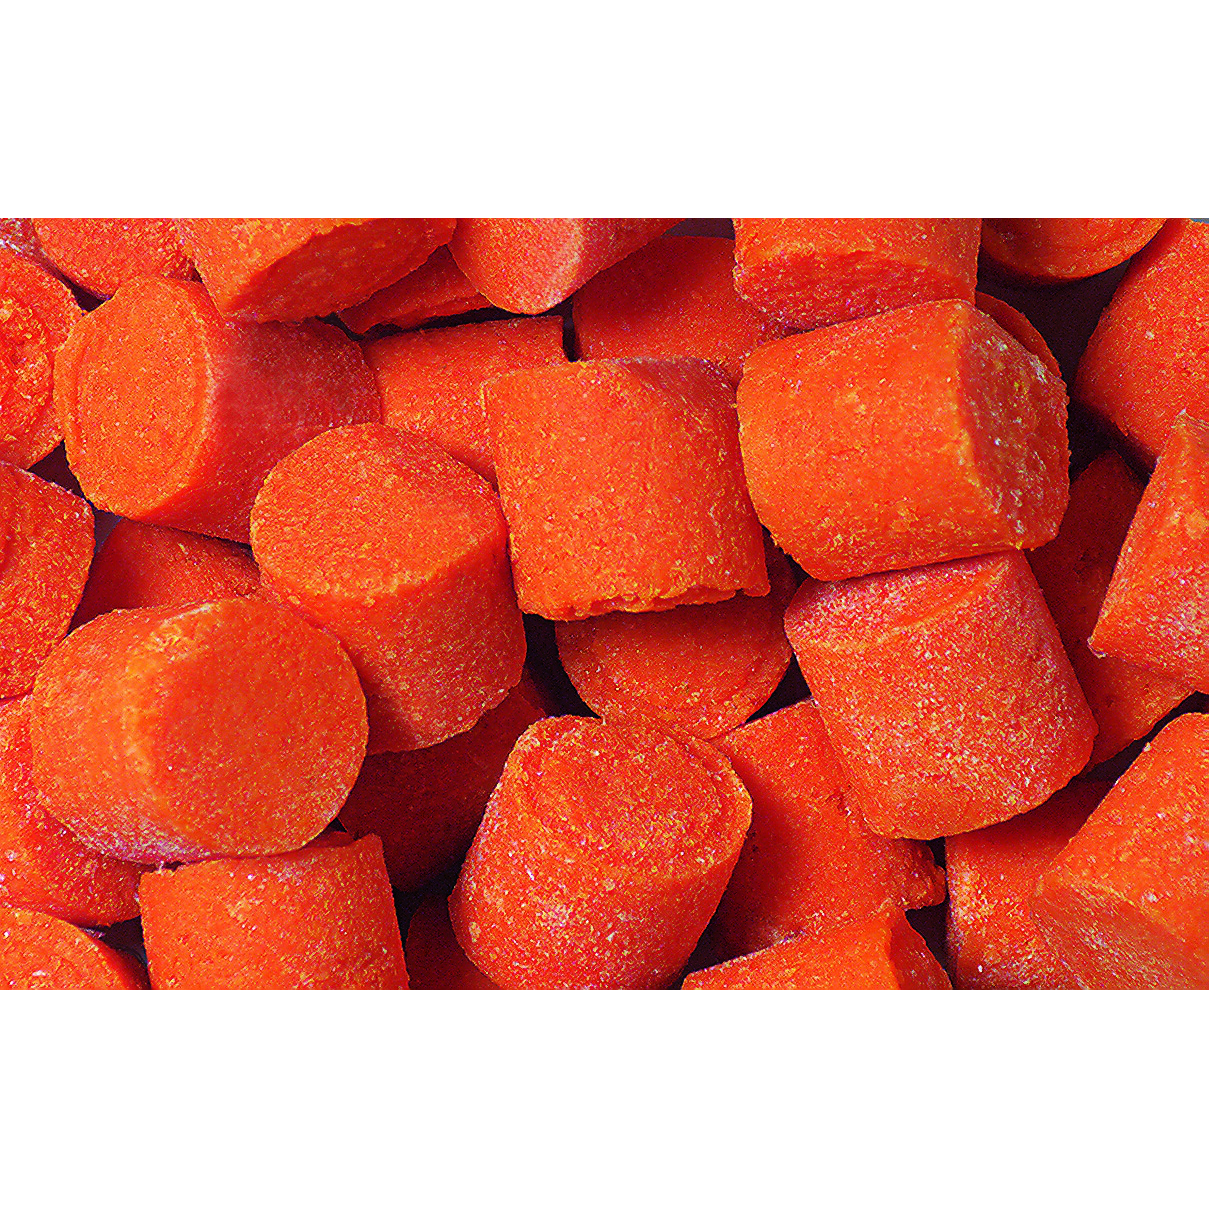 Food Service porkkanasose